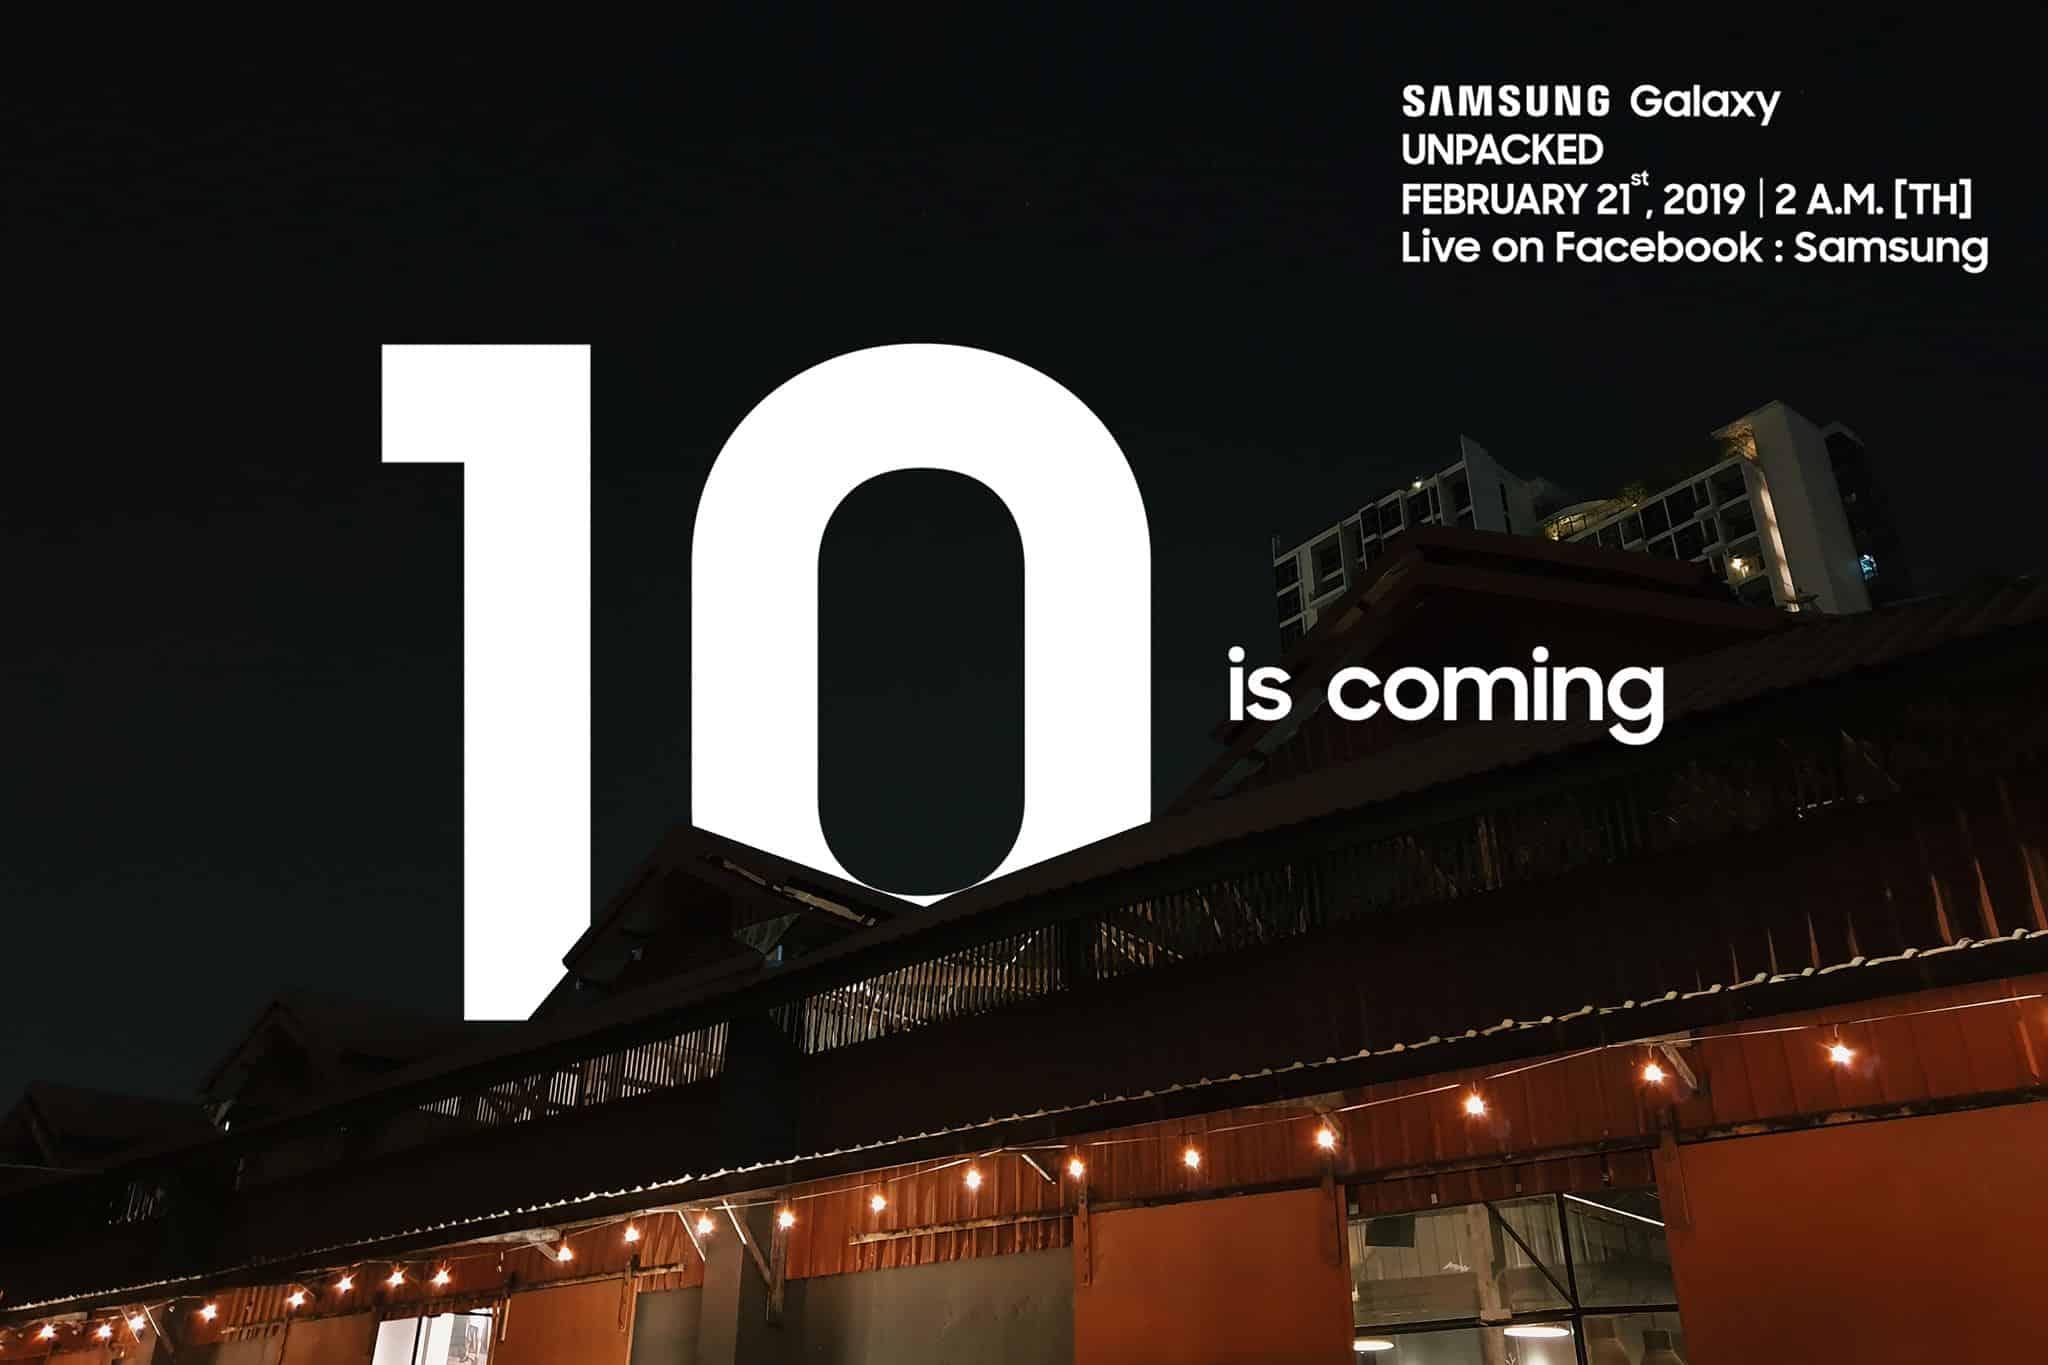 10 is coming 09 - ซัมซุงชวนแชร์ภาพติดแฮชแท็ก #10iscoming ลุ้นเข้าร่วมงานเปิดตัว Galaxy S10